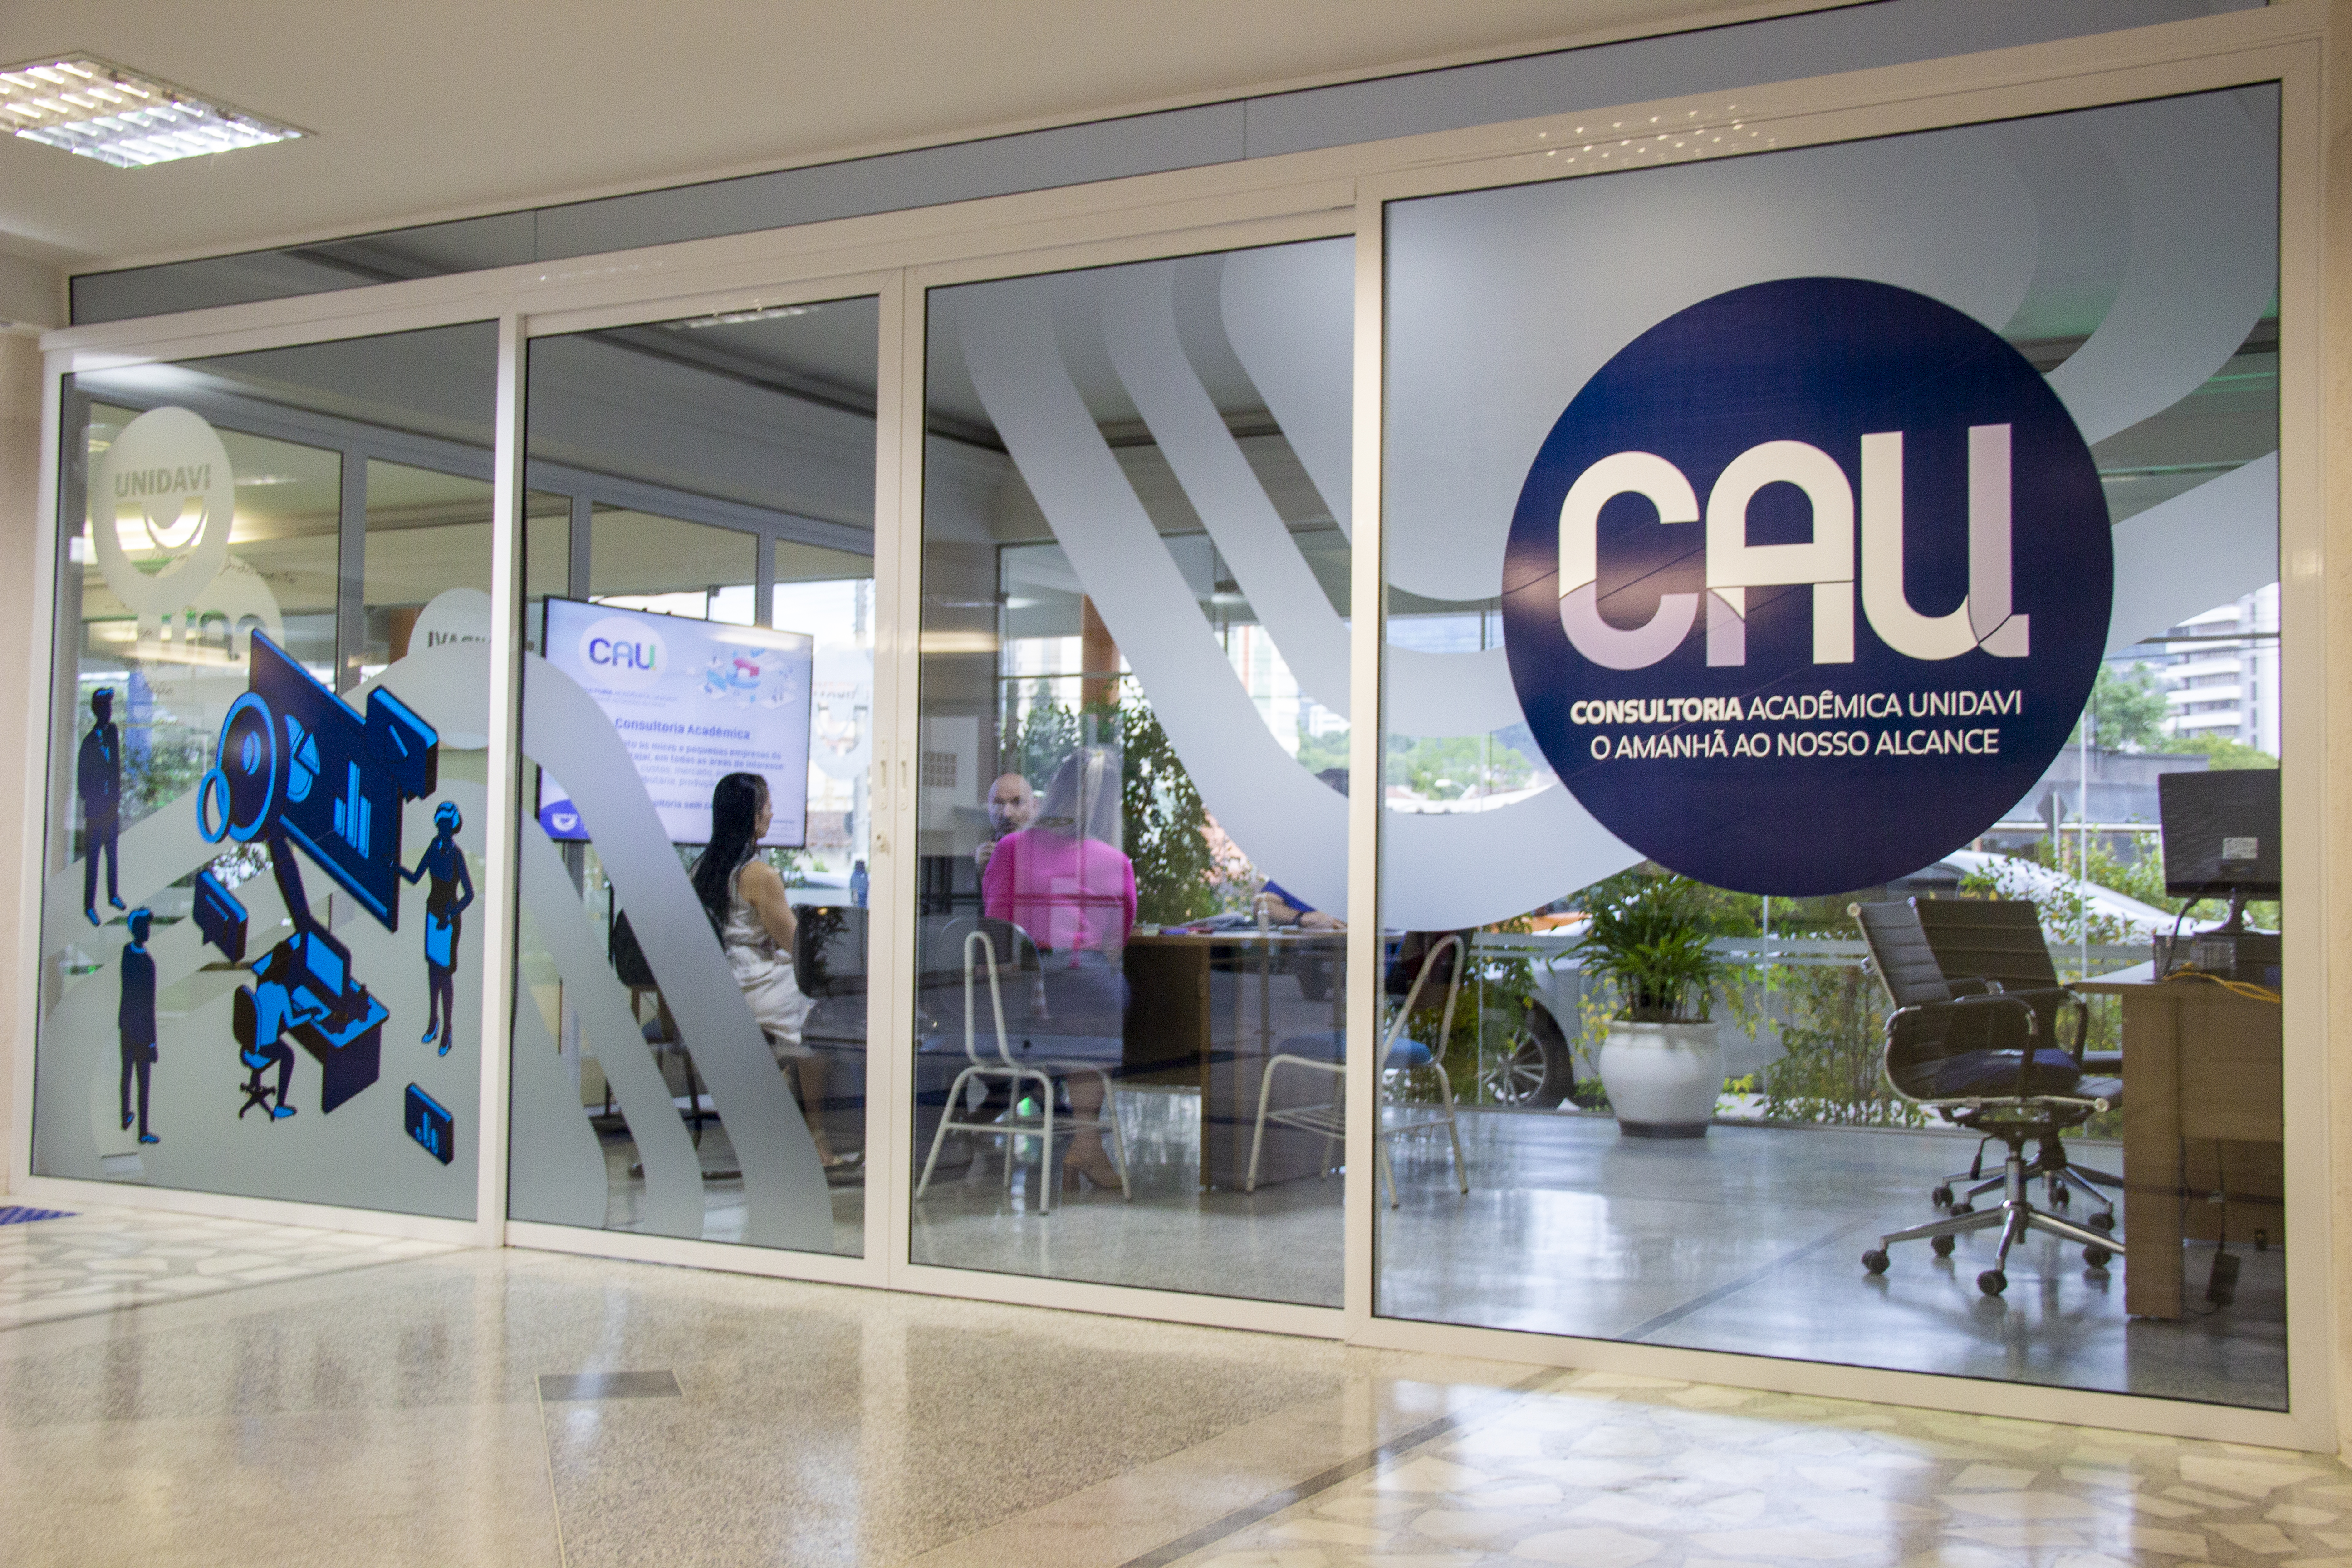 CAU - Consultoria Acadêmica Unidavi